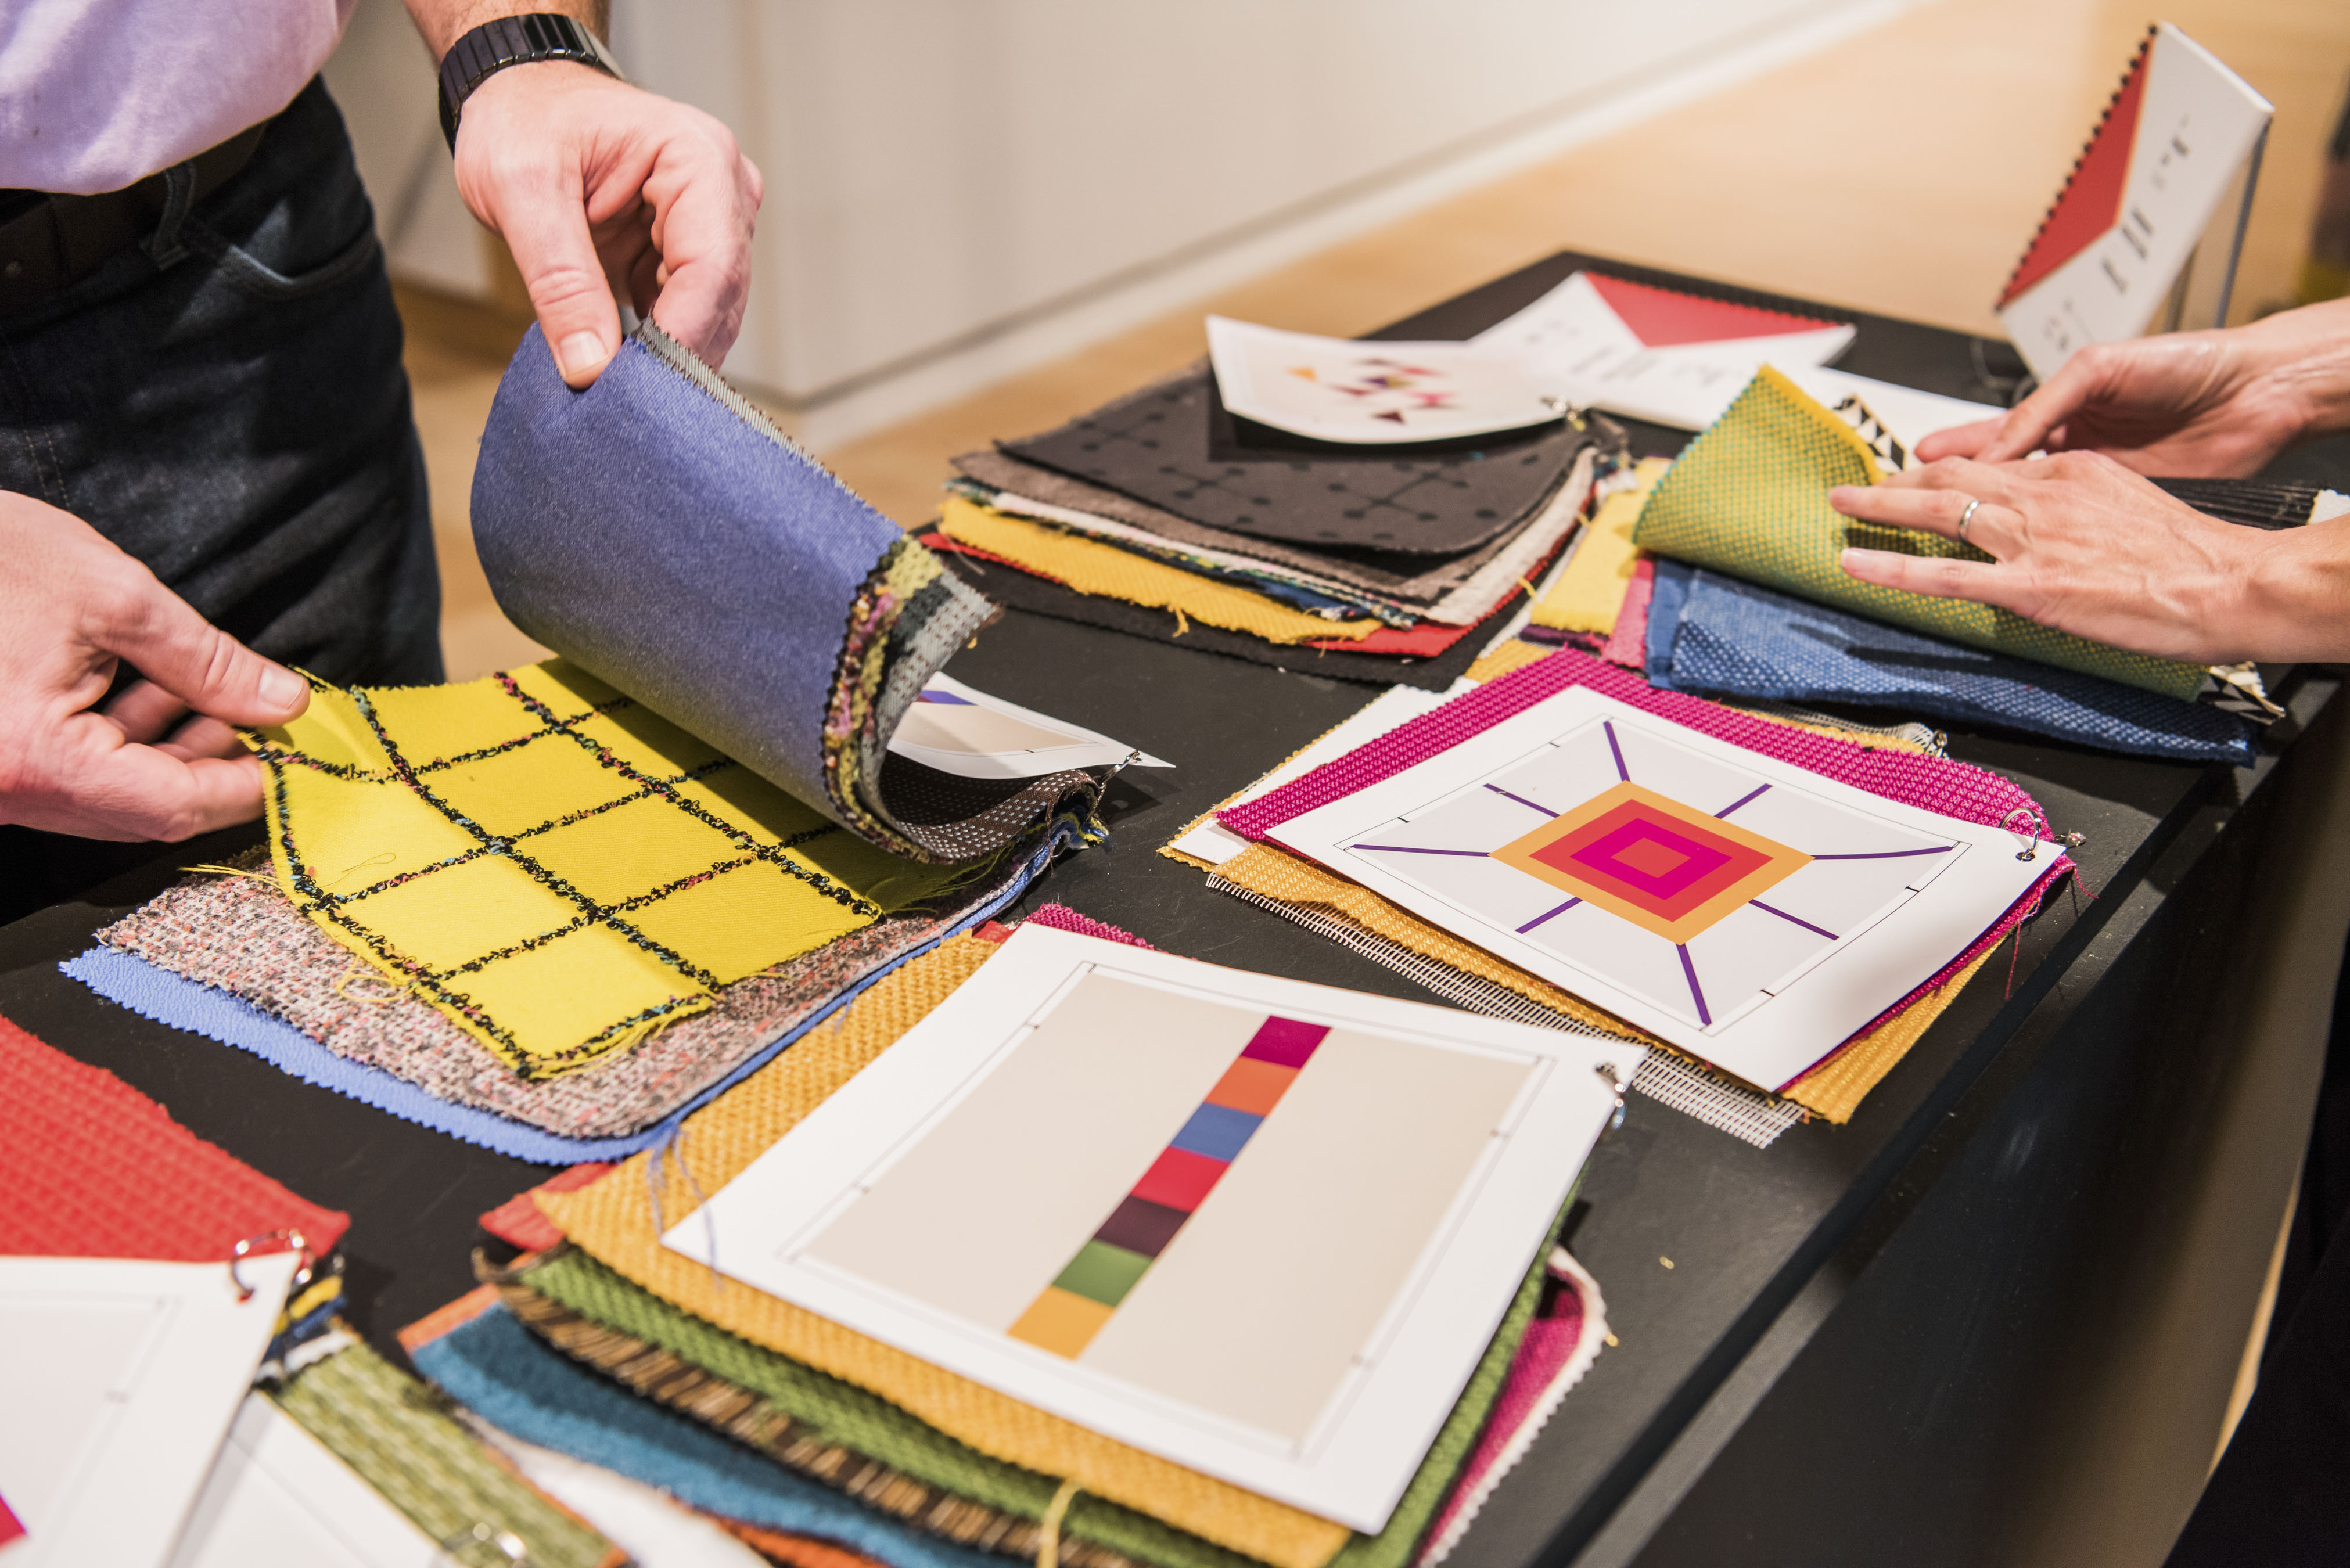 People flip through fabrics